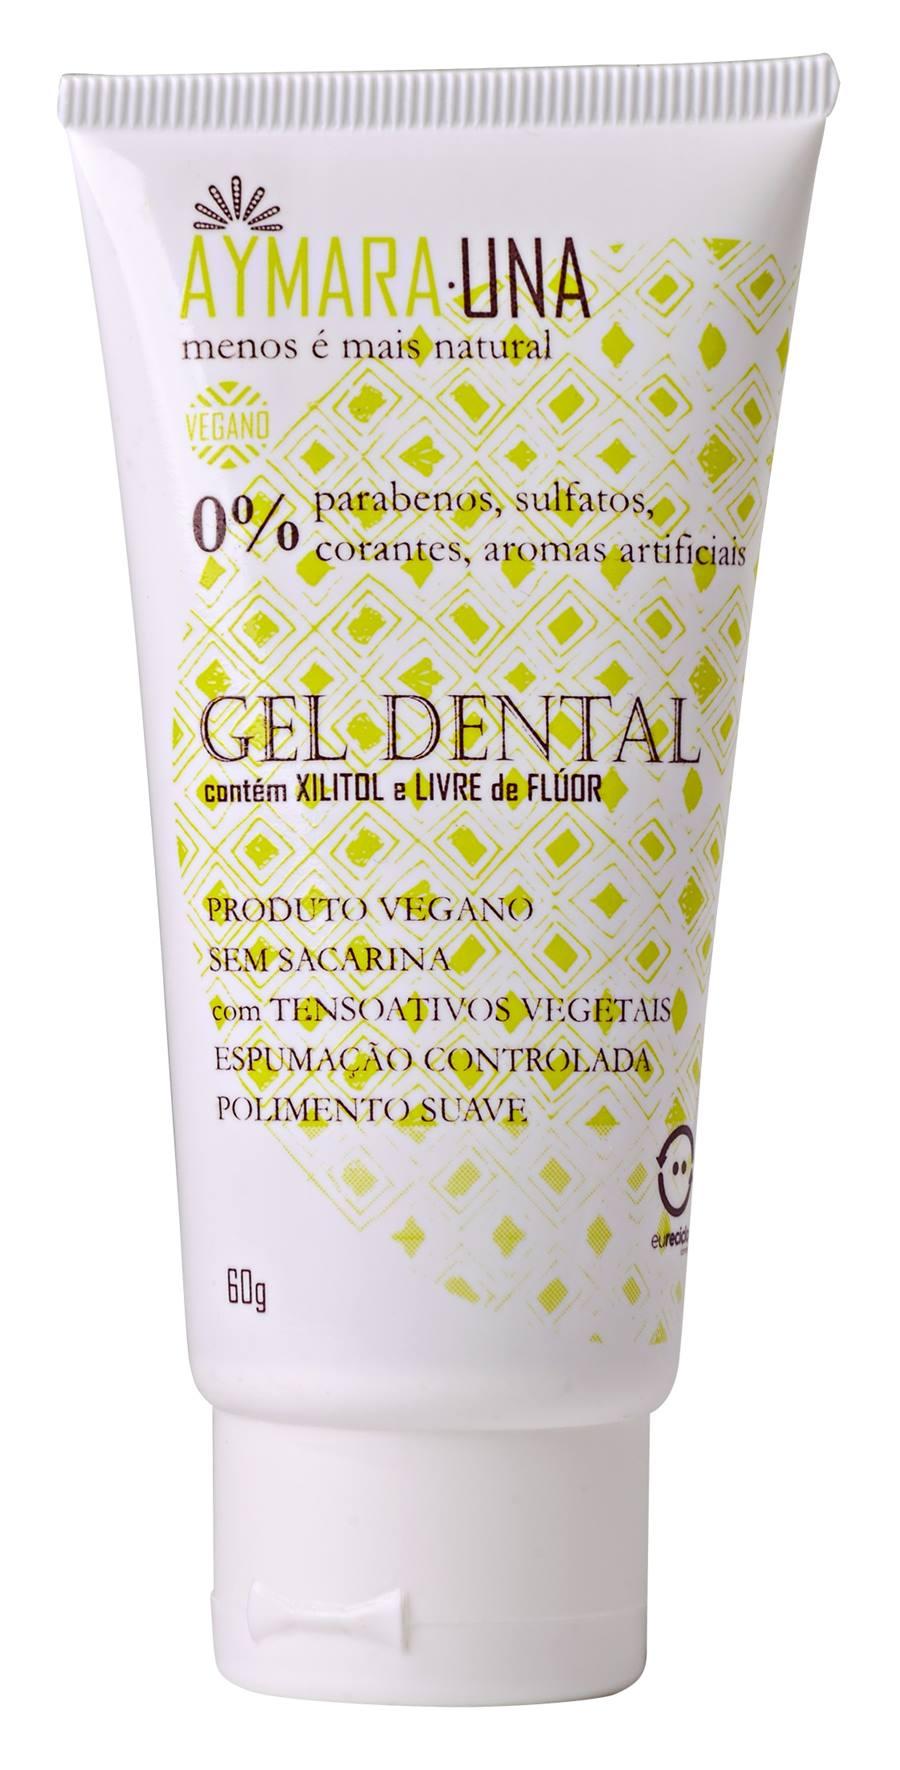 Gel Dental Sem Flúor VEGANO (Aymarauna) - 60g